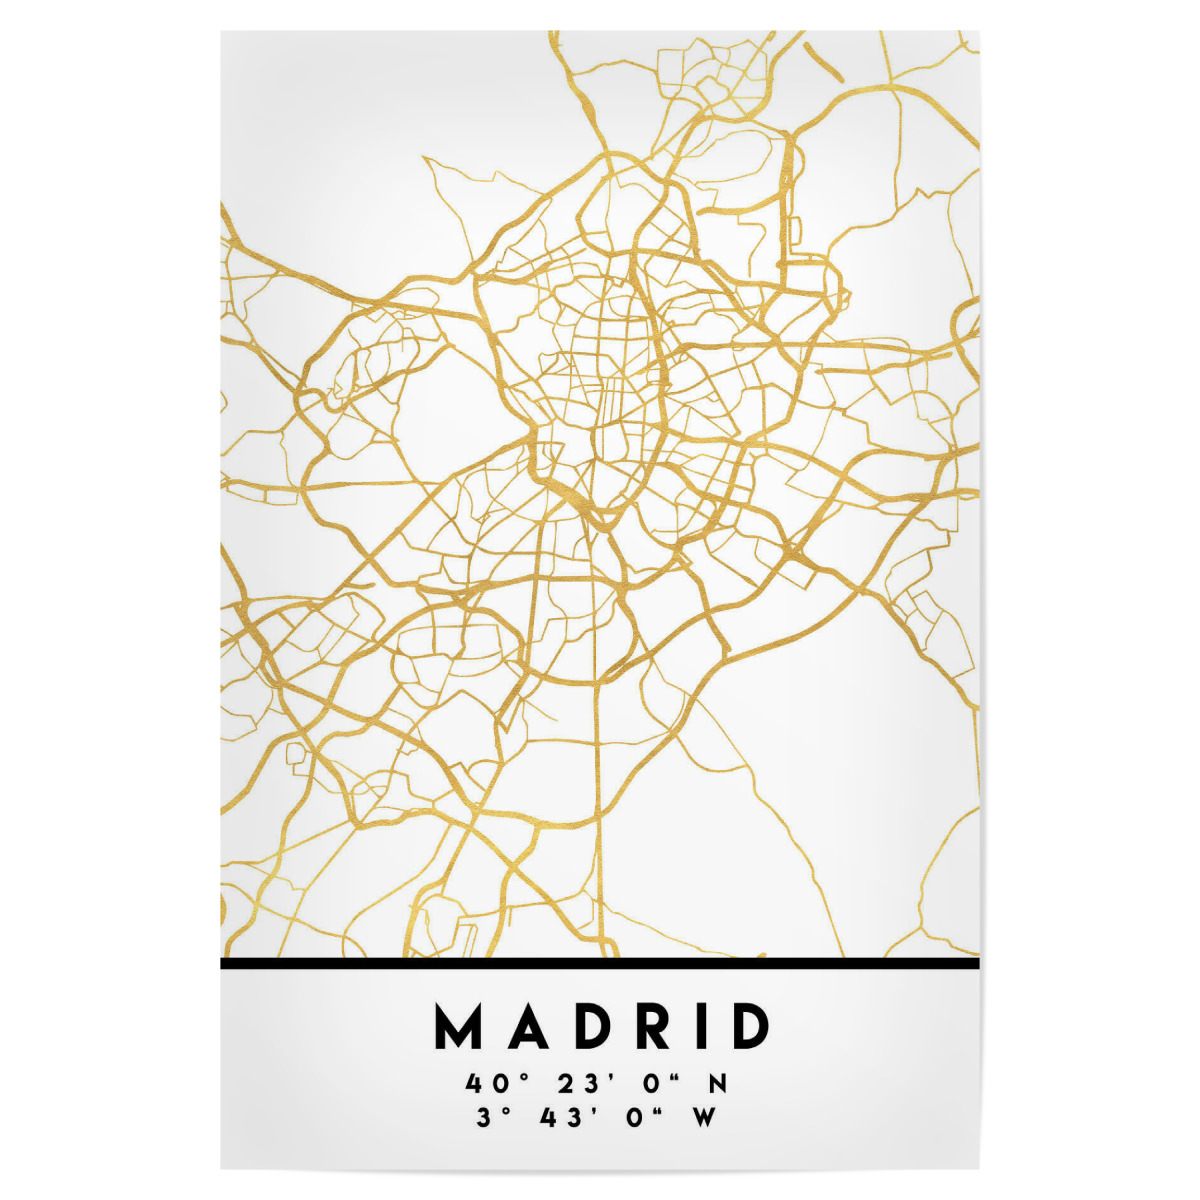 MADRID SPAIN STREET MAP ART als Poster bei artboxONE kaufen